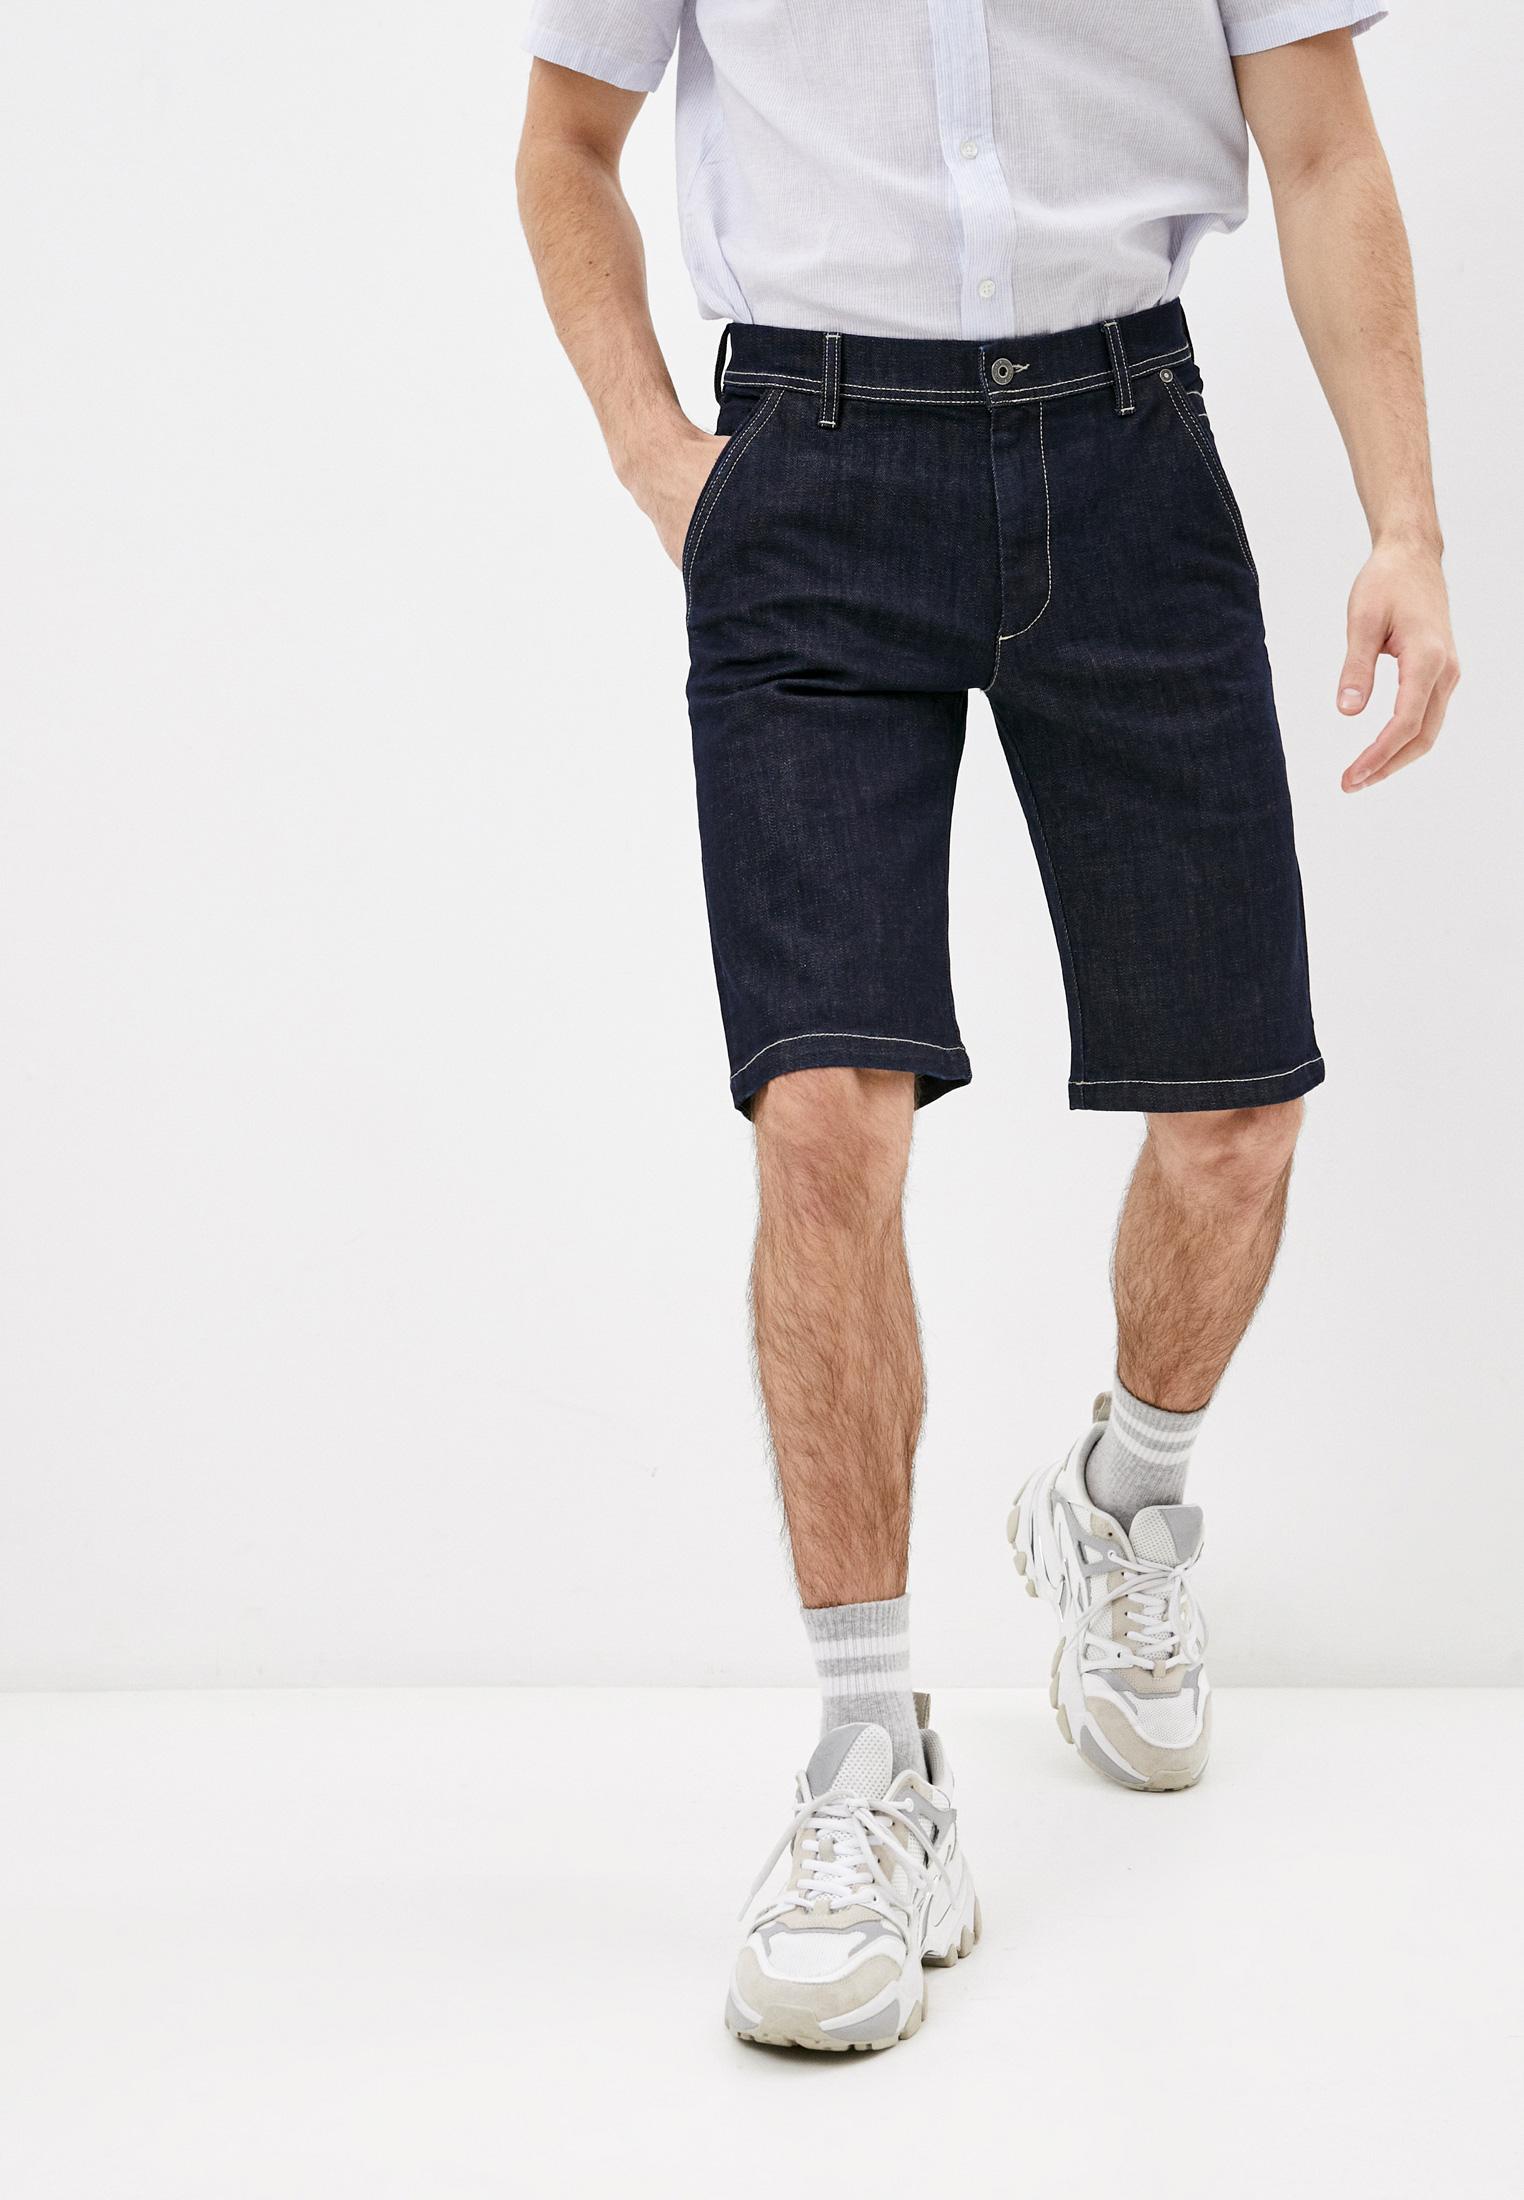 Мужские джинсовые шорты Bikkembergs (Биккембергс) CO20100S3182003B